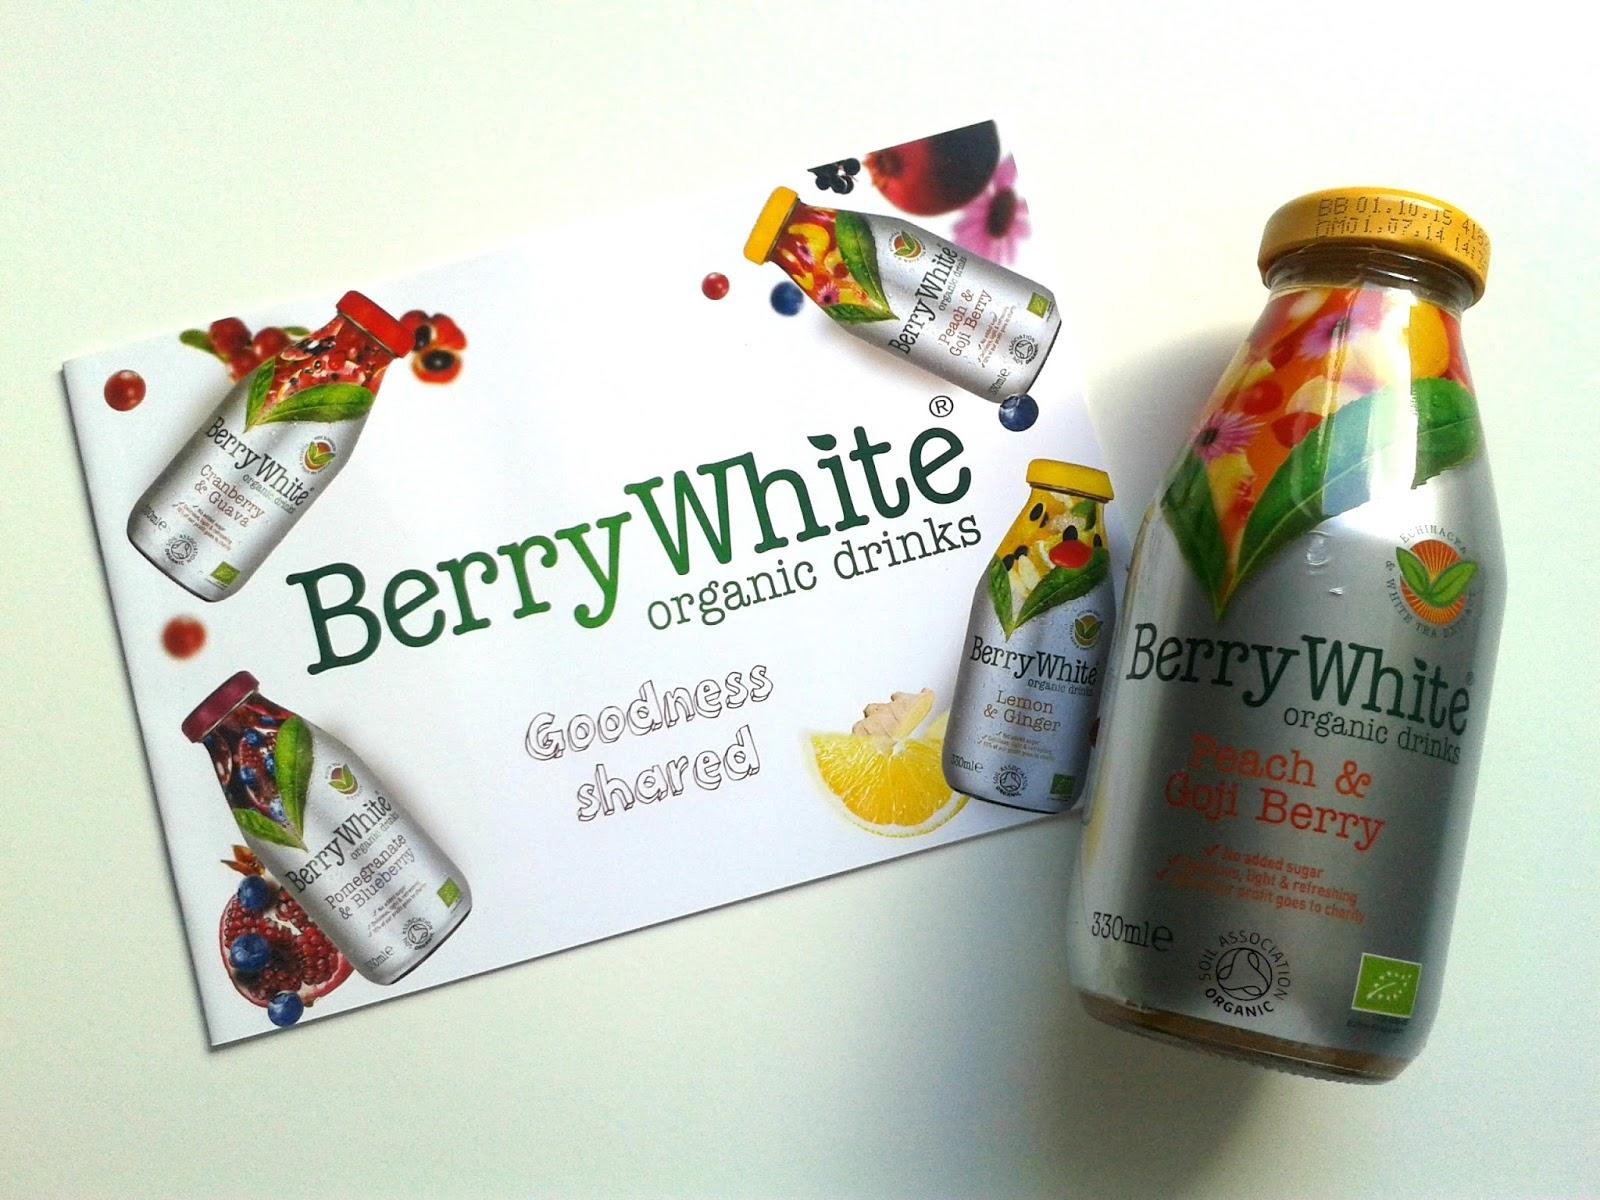 Berry White Peach & Goji Berry Organic Drink August Degustabox Review